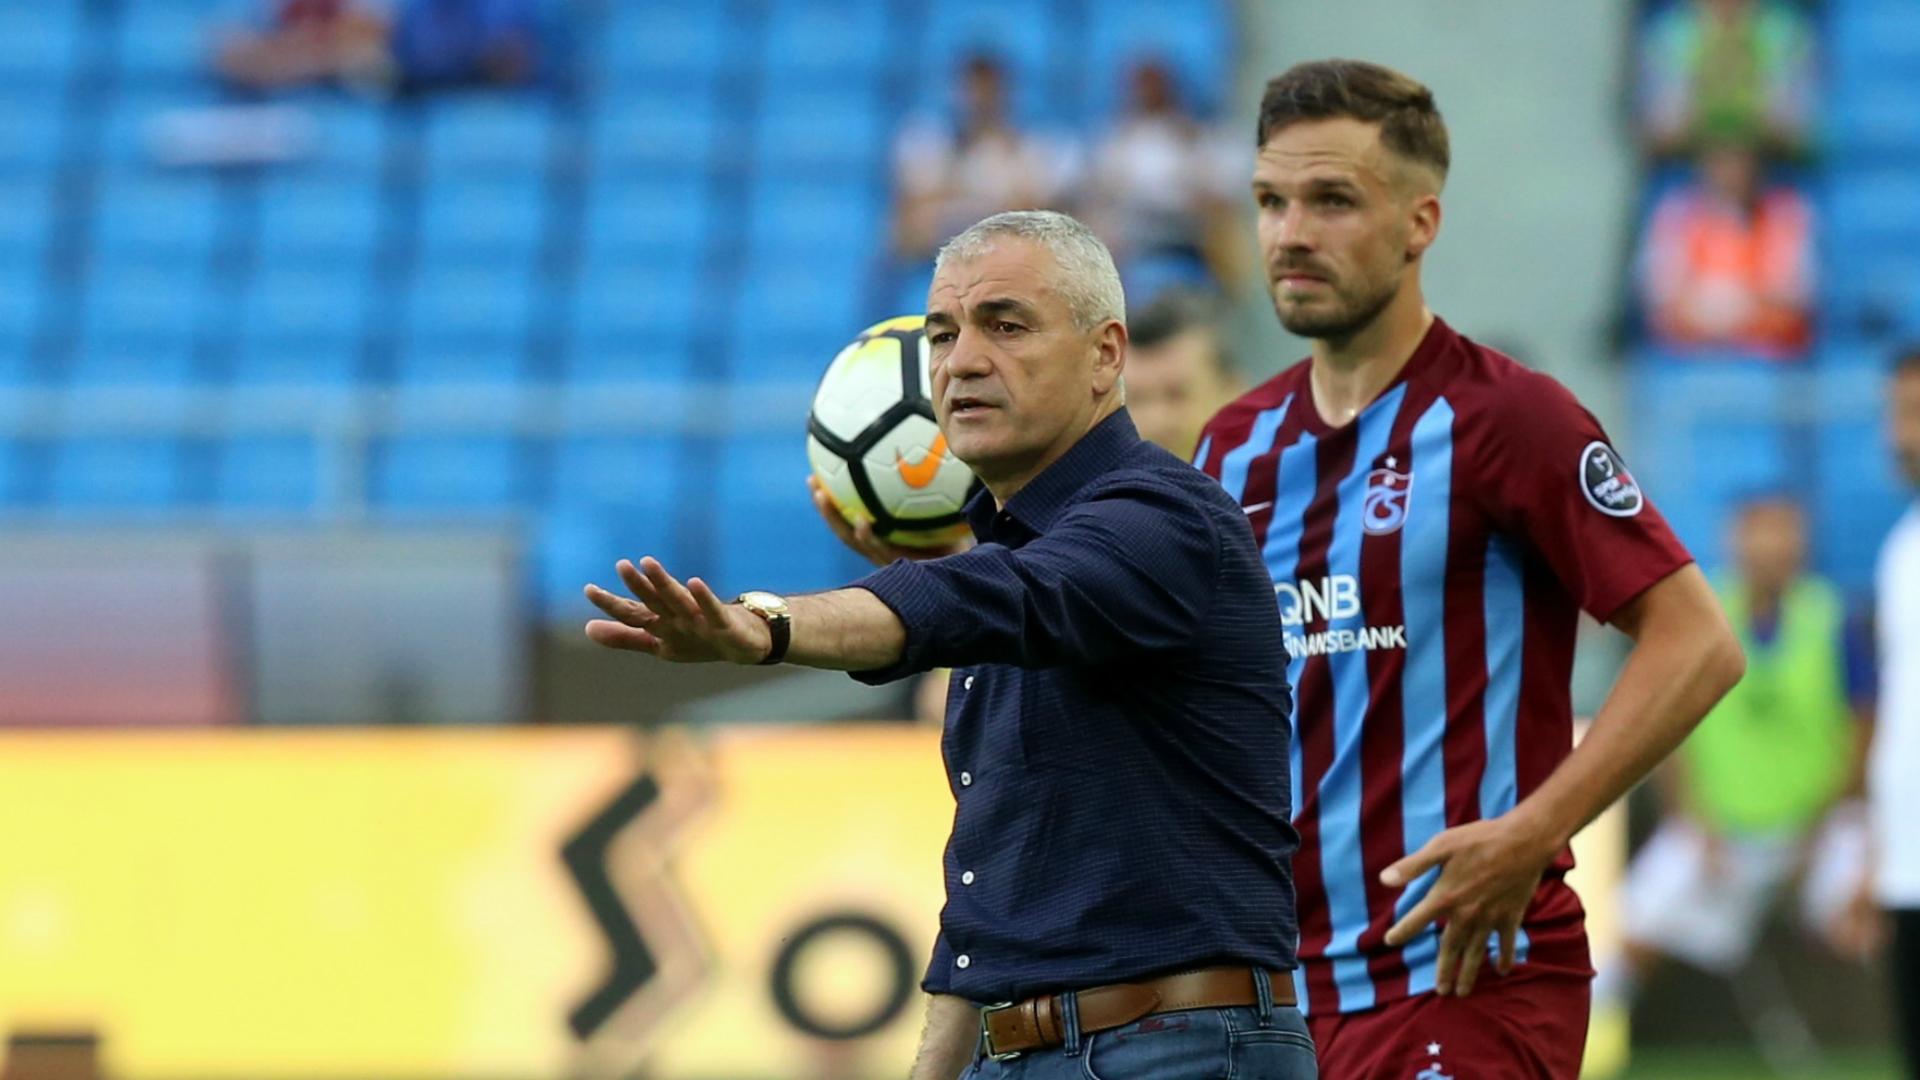 Trabzonspor Karabukspor Riza Calimbay 051818